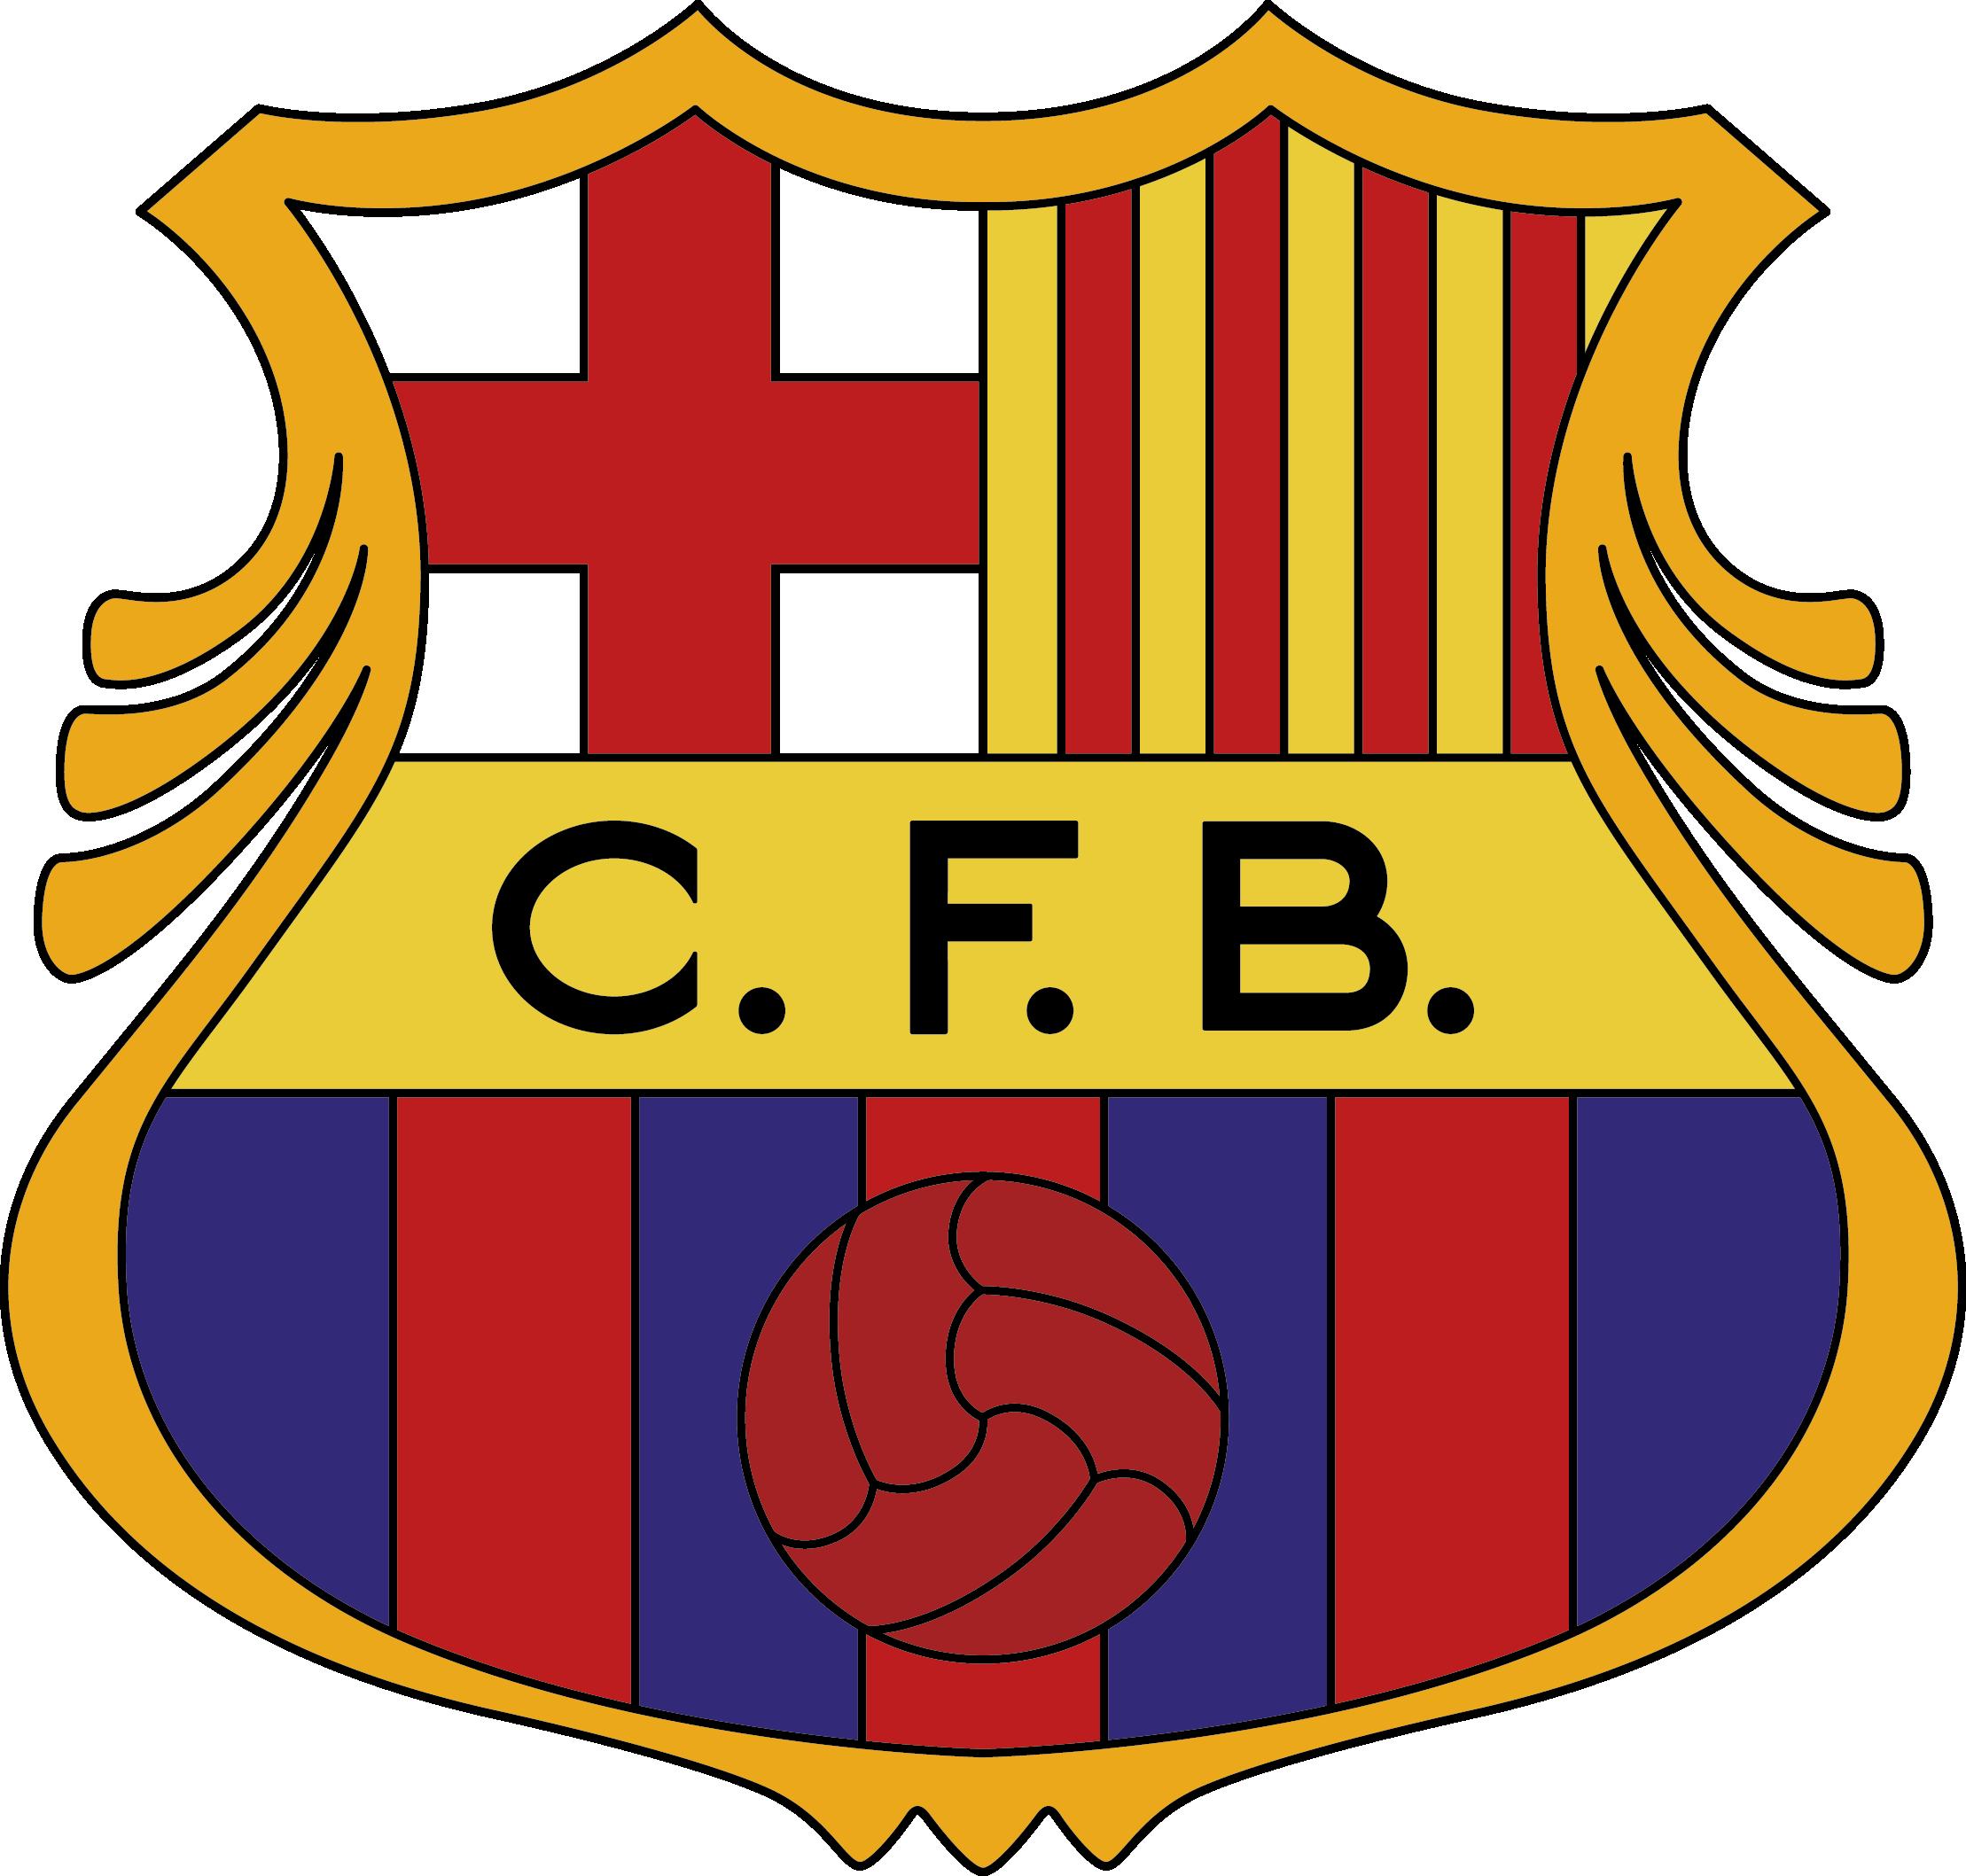 Clipart free football ticket stub image Barcelona | Football Logos | Pinterest | Camp nou and Futbol image